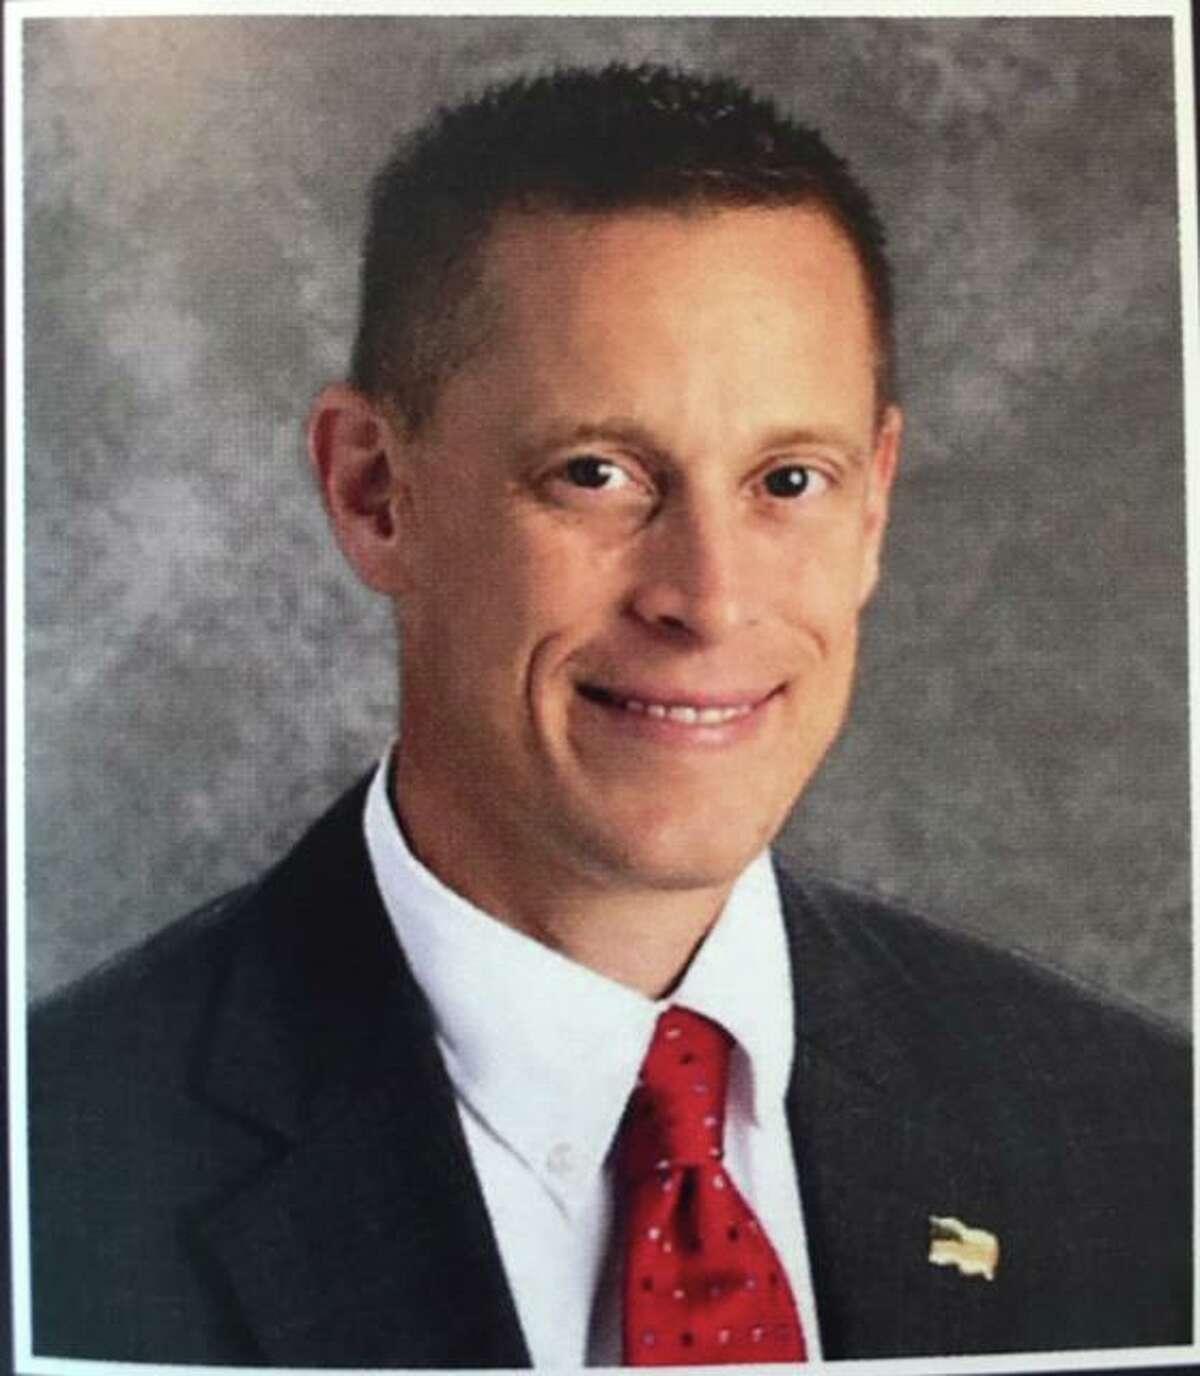 Scott Clayton Bethel Republican Board of Education candidate